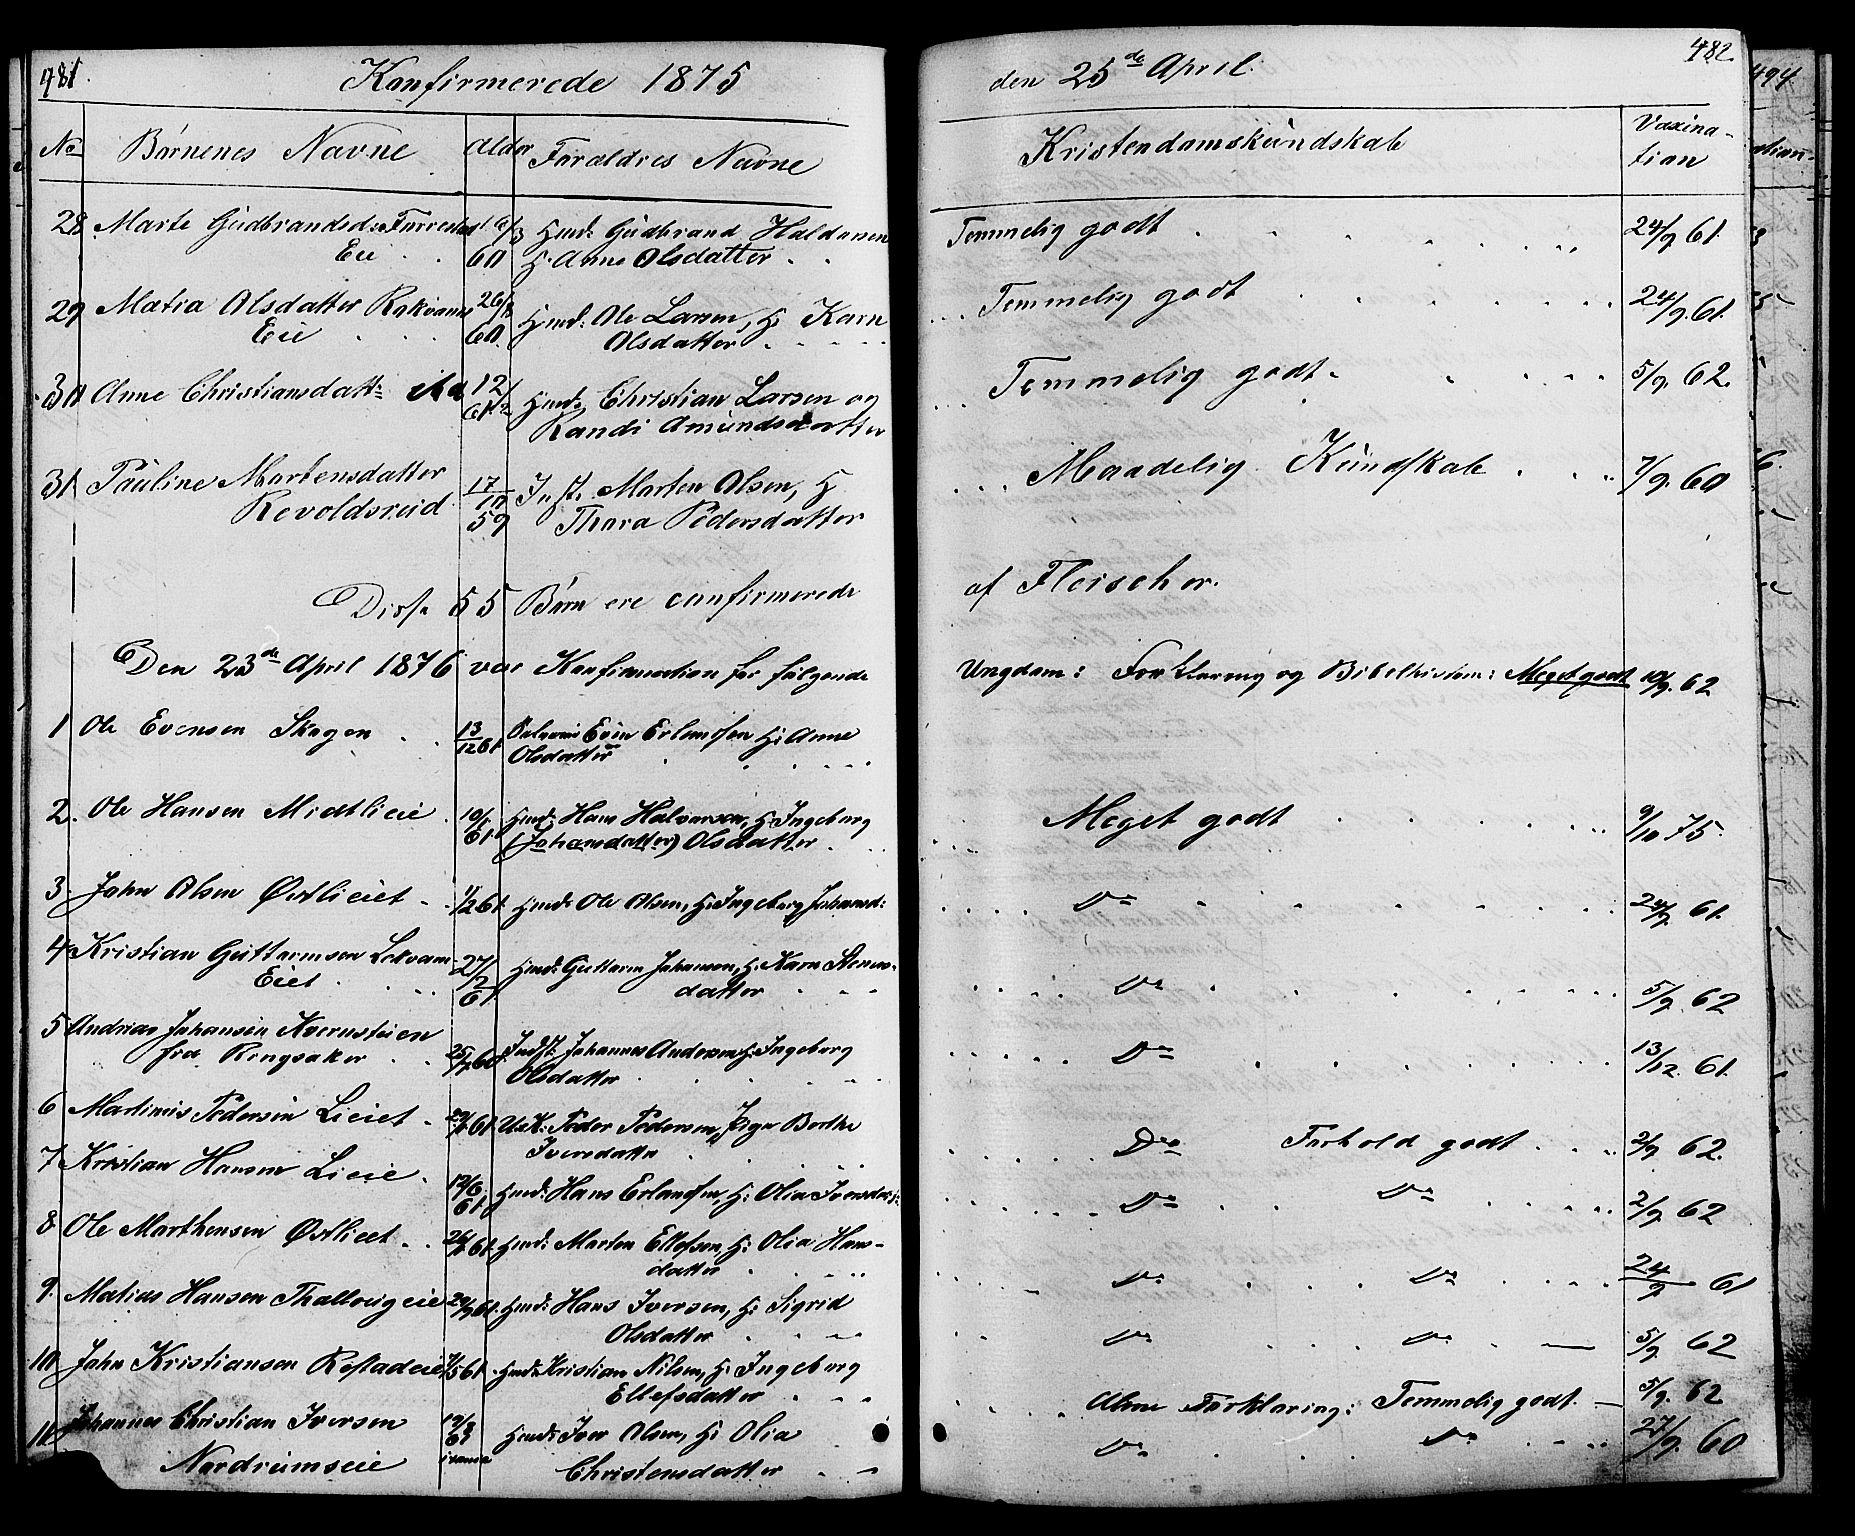 SAH, Østre Gausdal prestekontor, Klokkerbok nr. 1, 1863-1893, s. 481-482